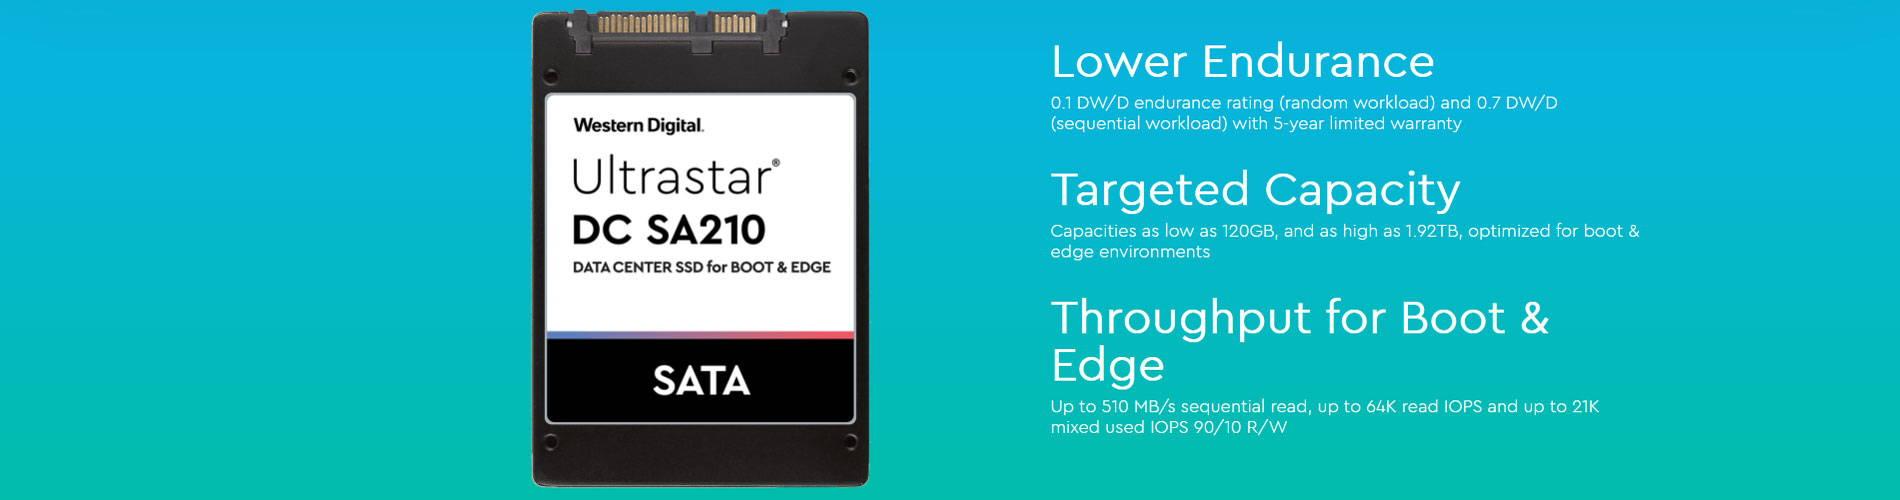 Ultrastar DC SA210